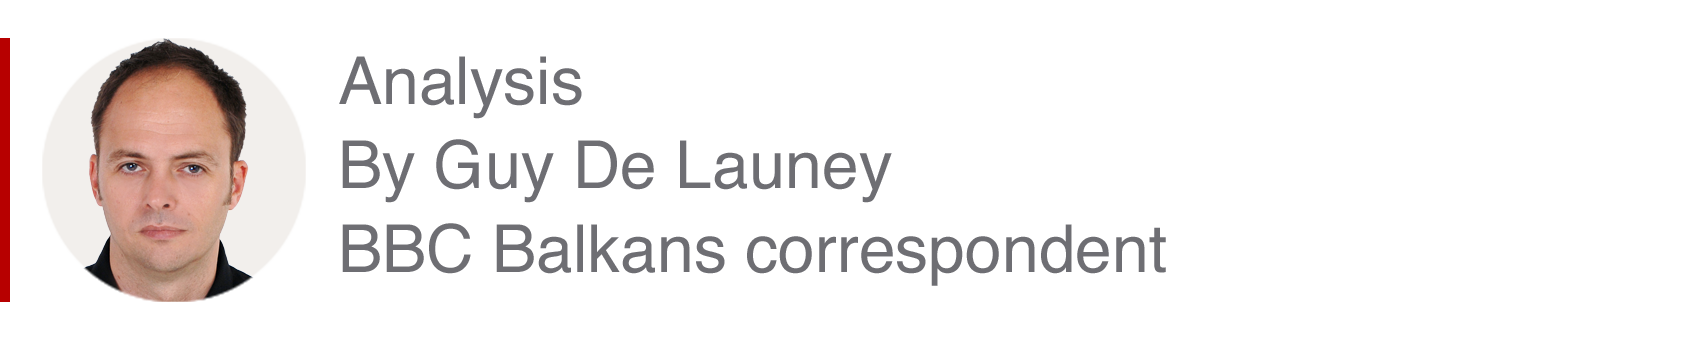 Analysis box by Guy De Launey, Balkans correspondent